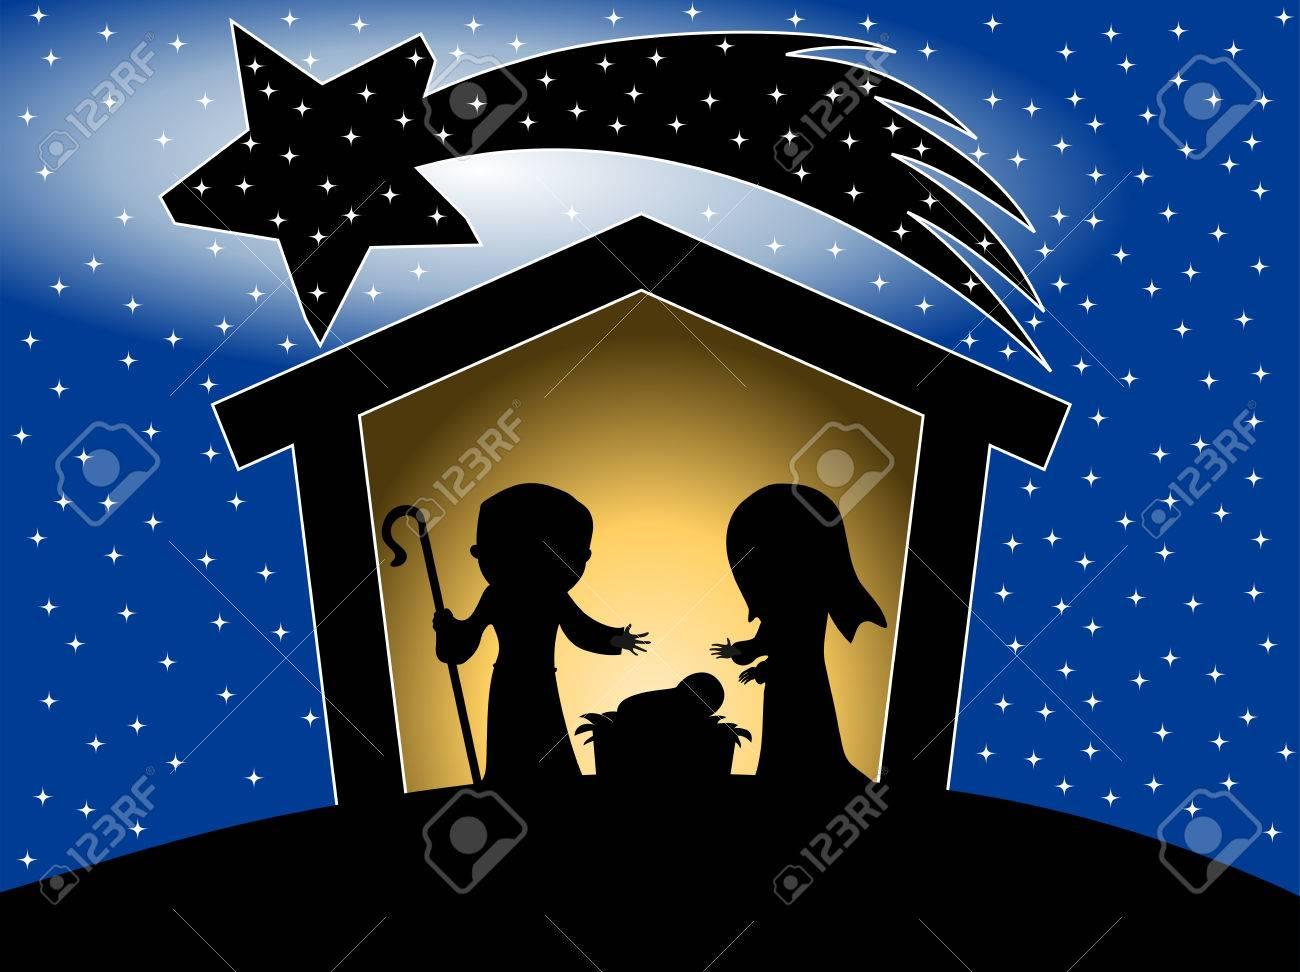 Silhouette Of Christmas Nativity Scene Against Starry Sky Background Stock Vector